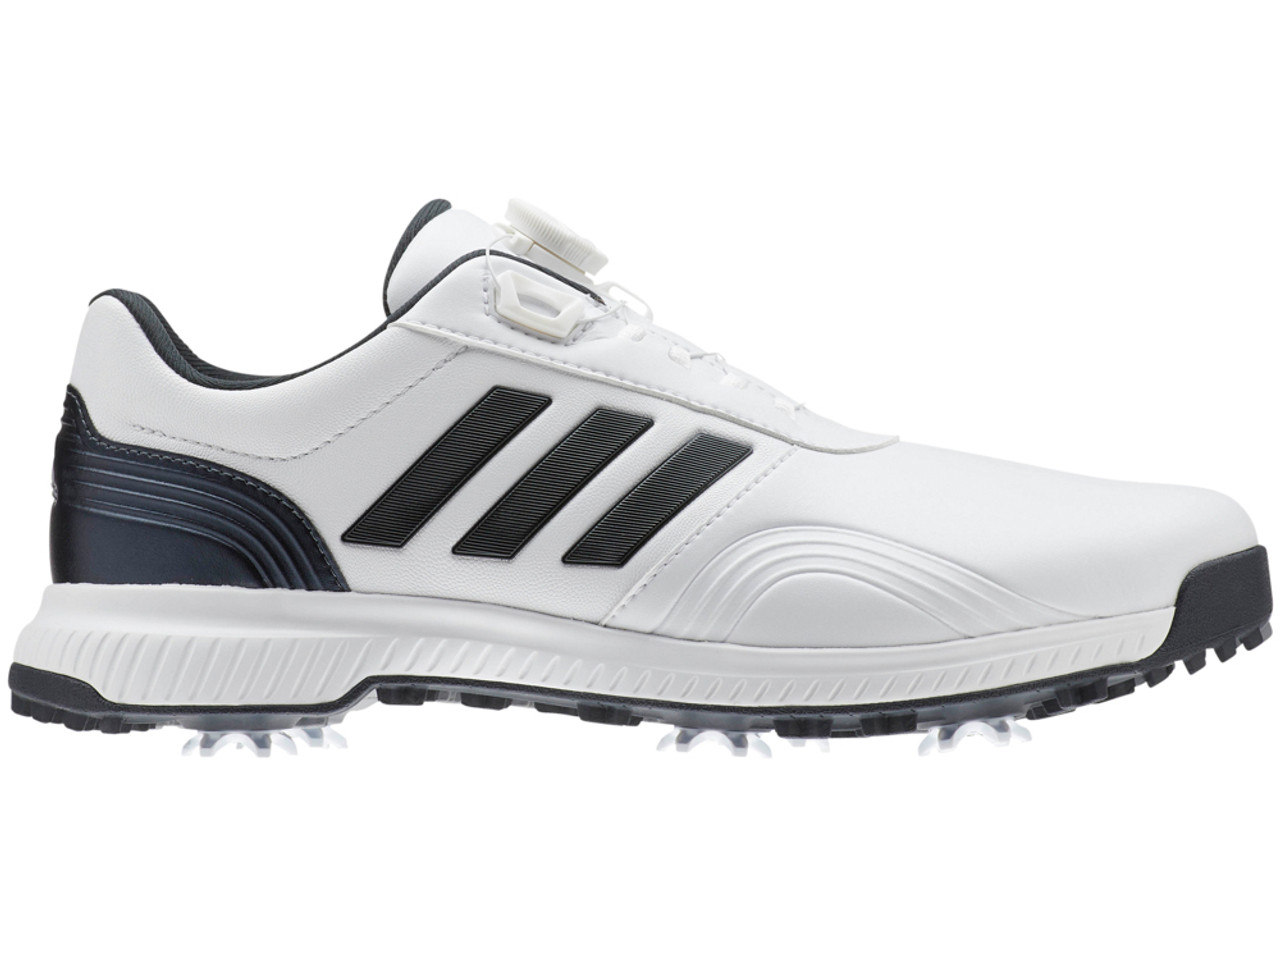 new products 4572c f0db9 Adidas CP Traxion BOA Golf Shoes - FTWR White/Black Blue